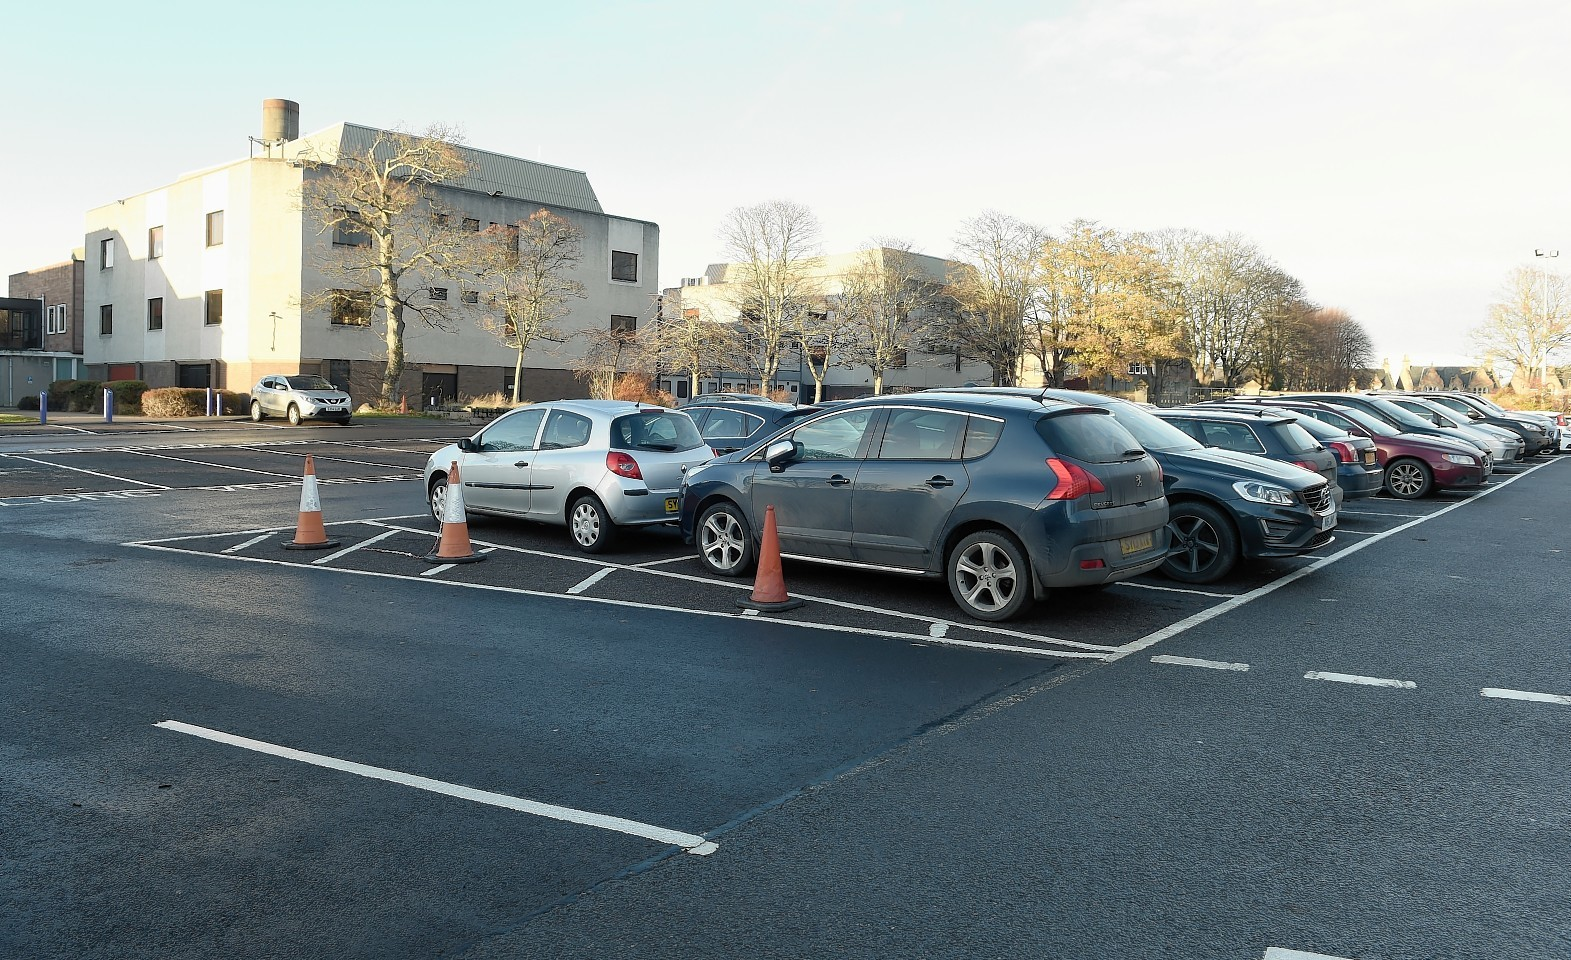 Highland Council car park at Glenurquart Road, Inverness